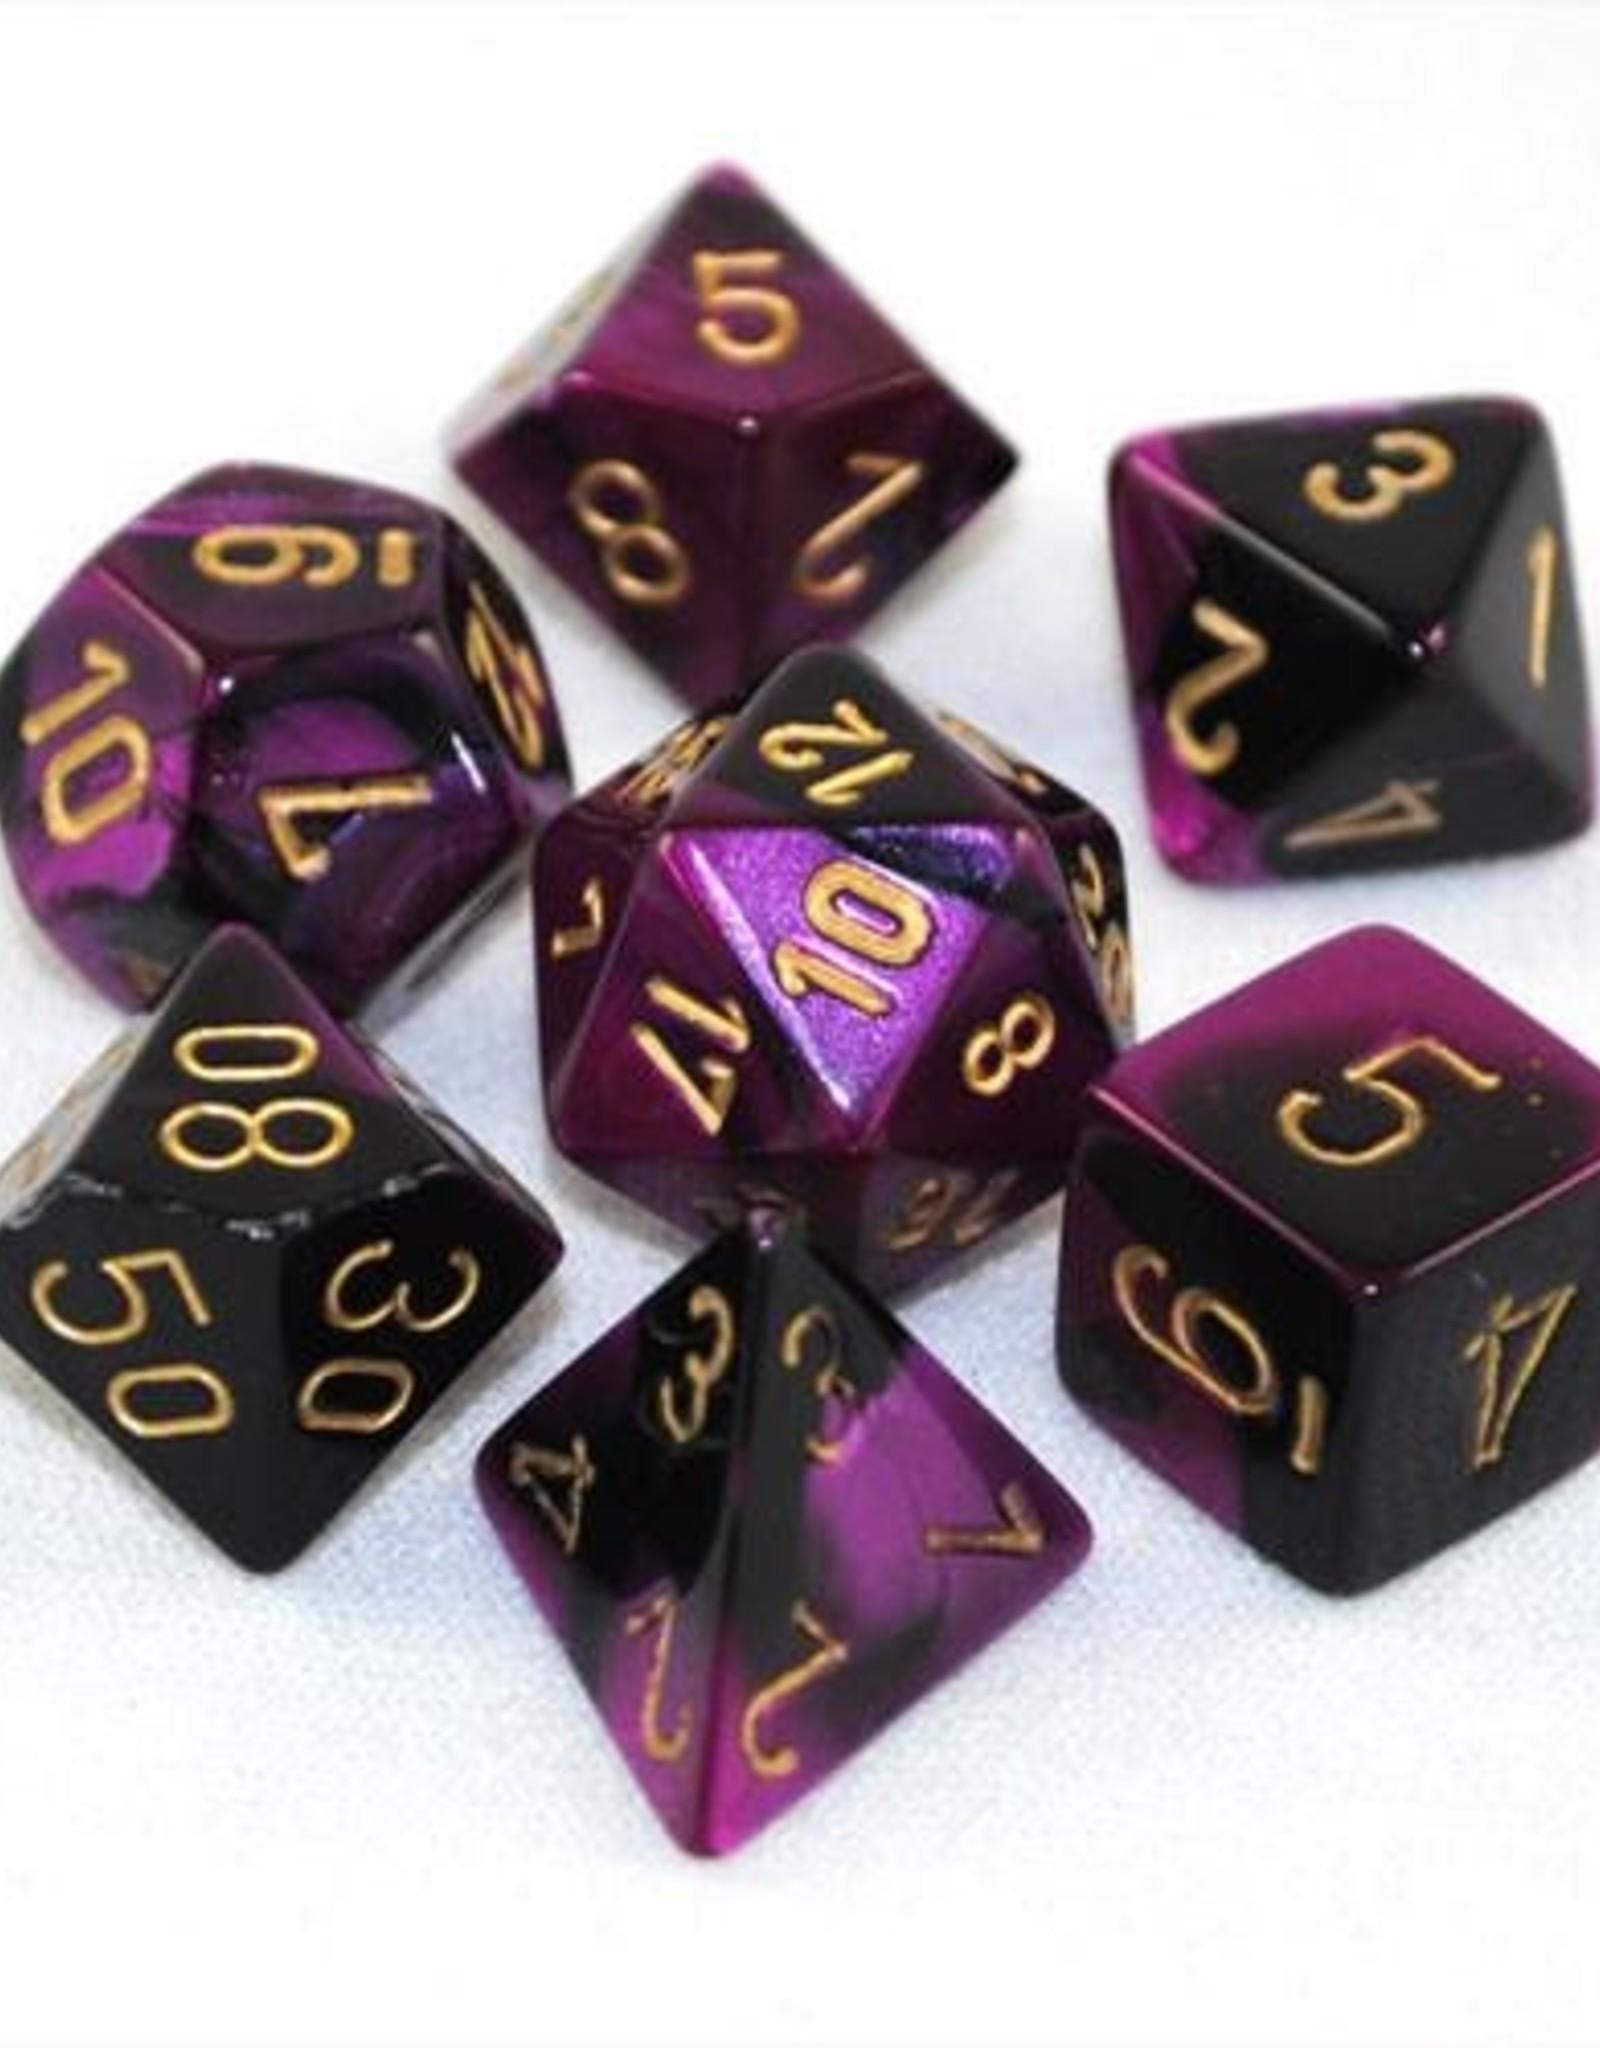 Chessex Chessex 7-Die set Gemini - Black-Purple/Gold